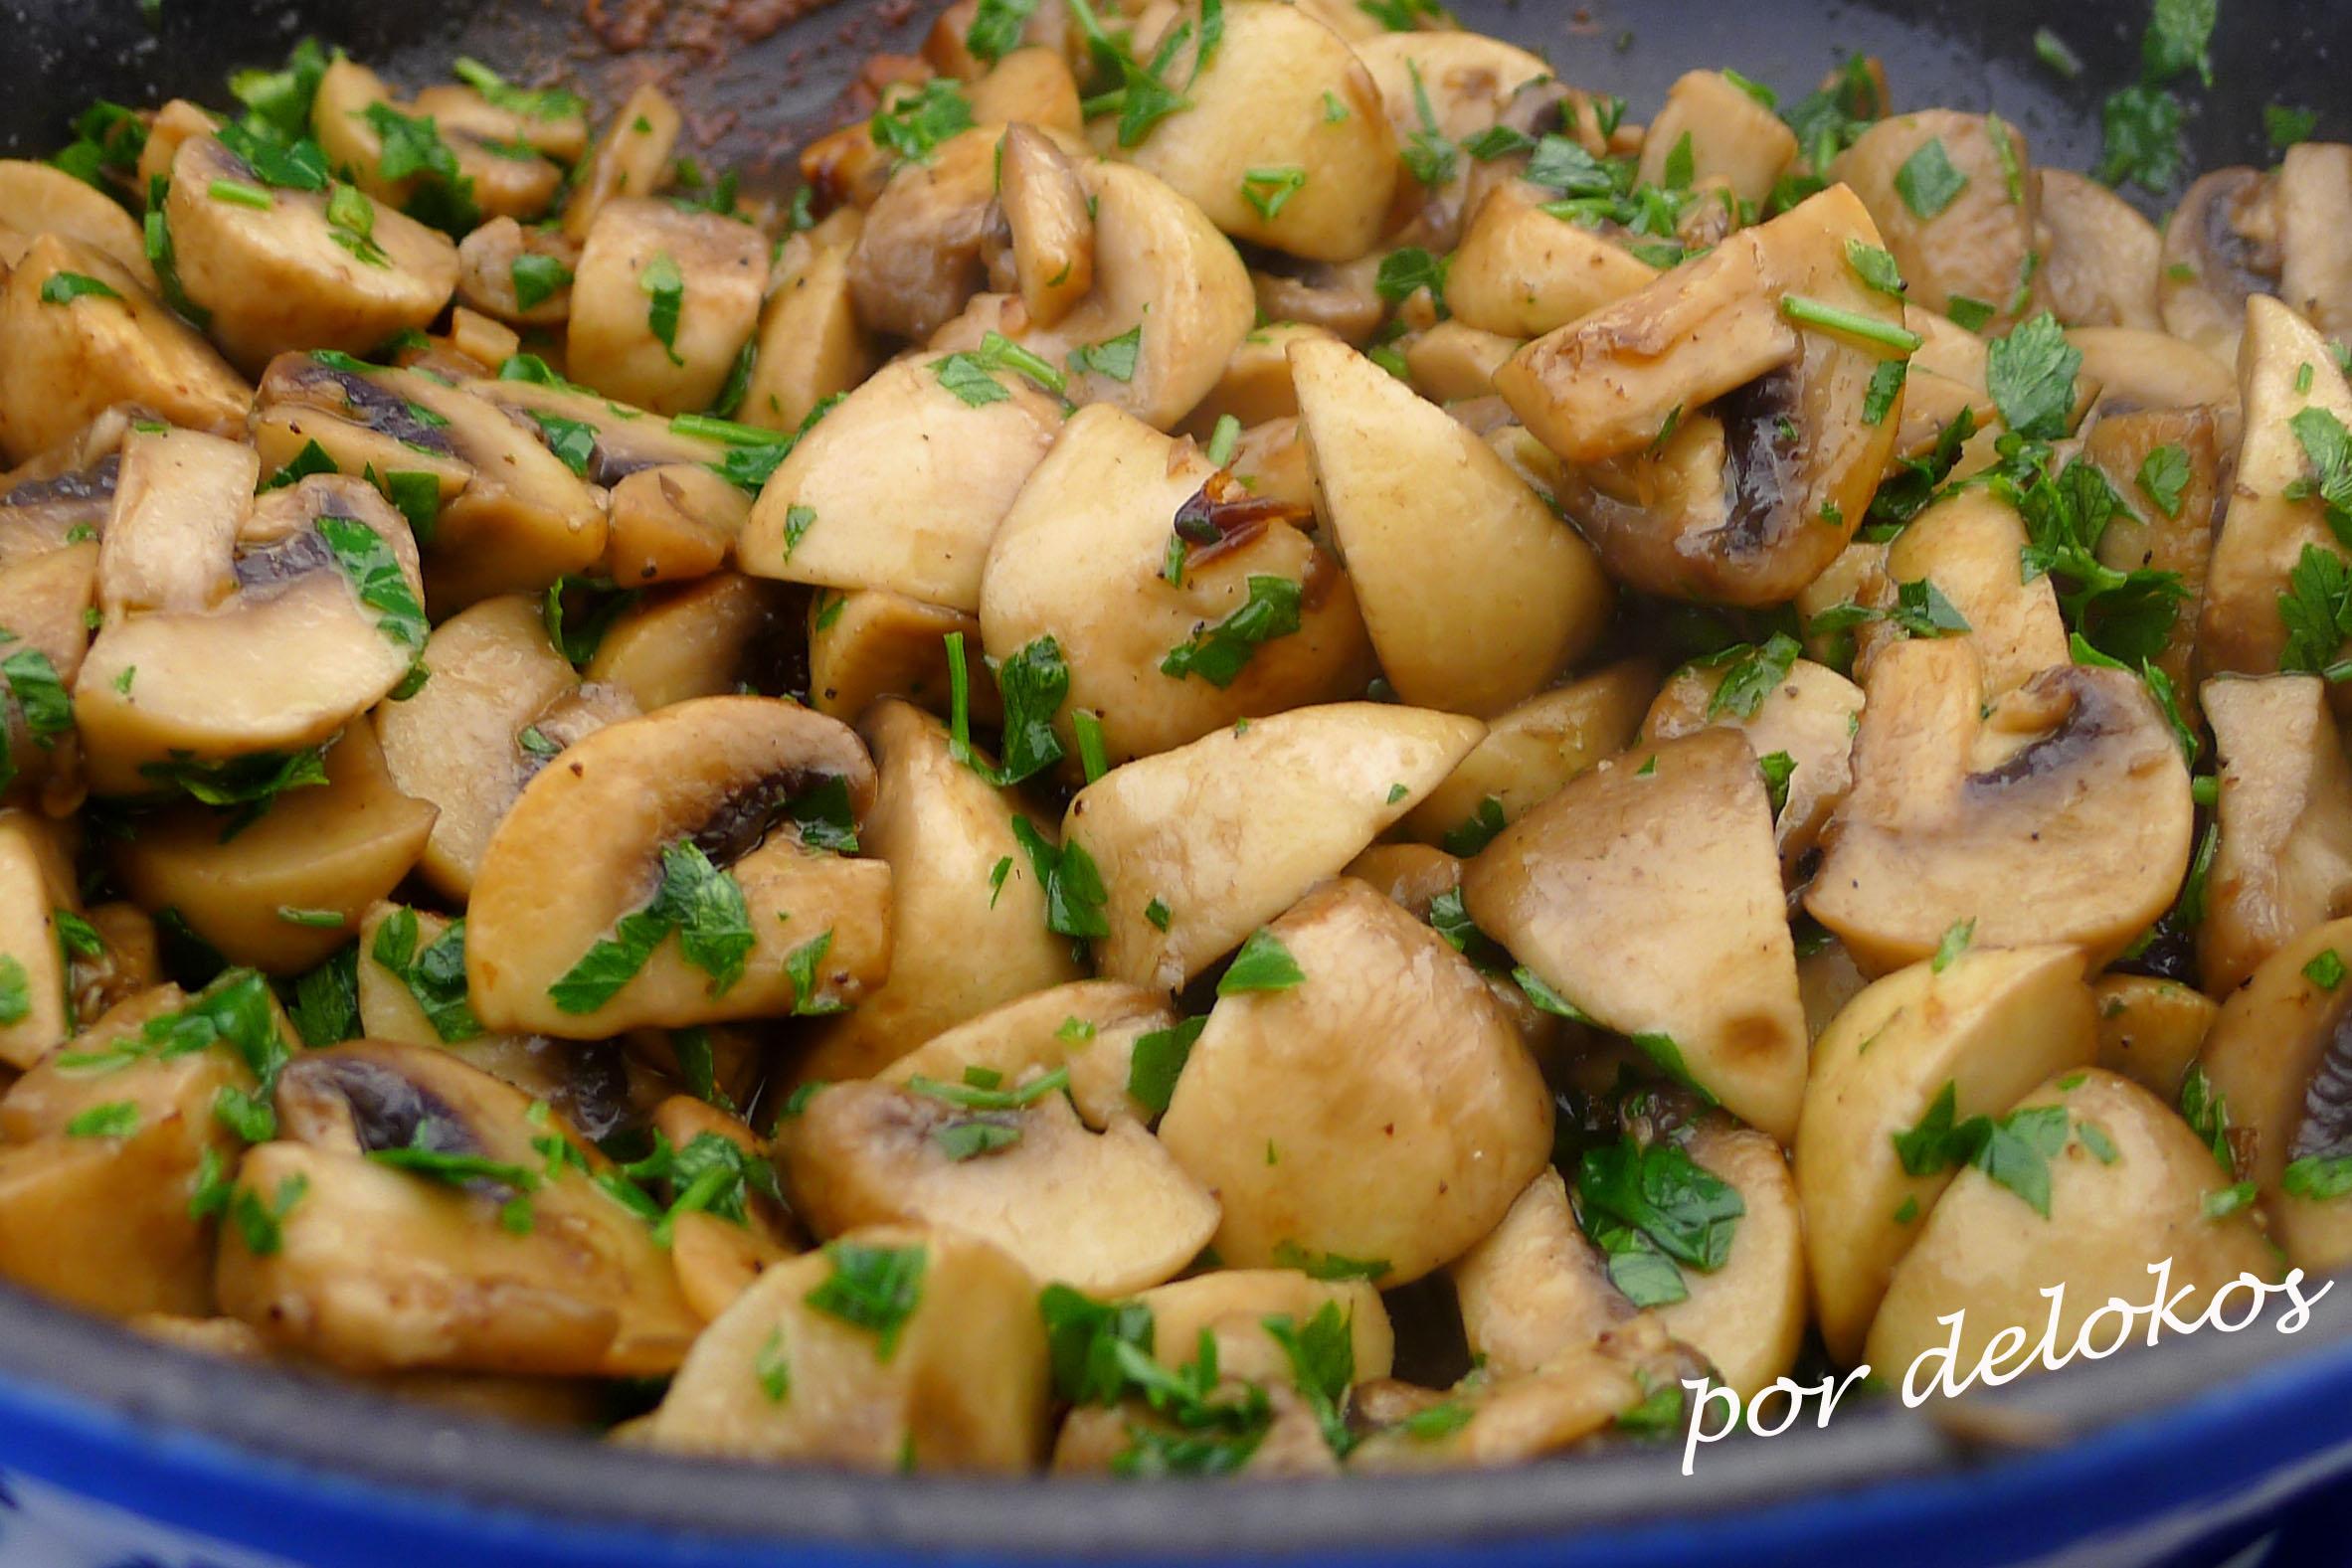 Bonito como cocinar champi ones frescos im genes for Cocinar guisantes frescos